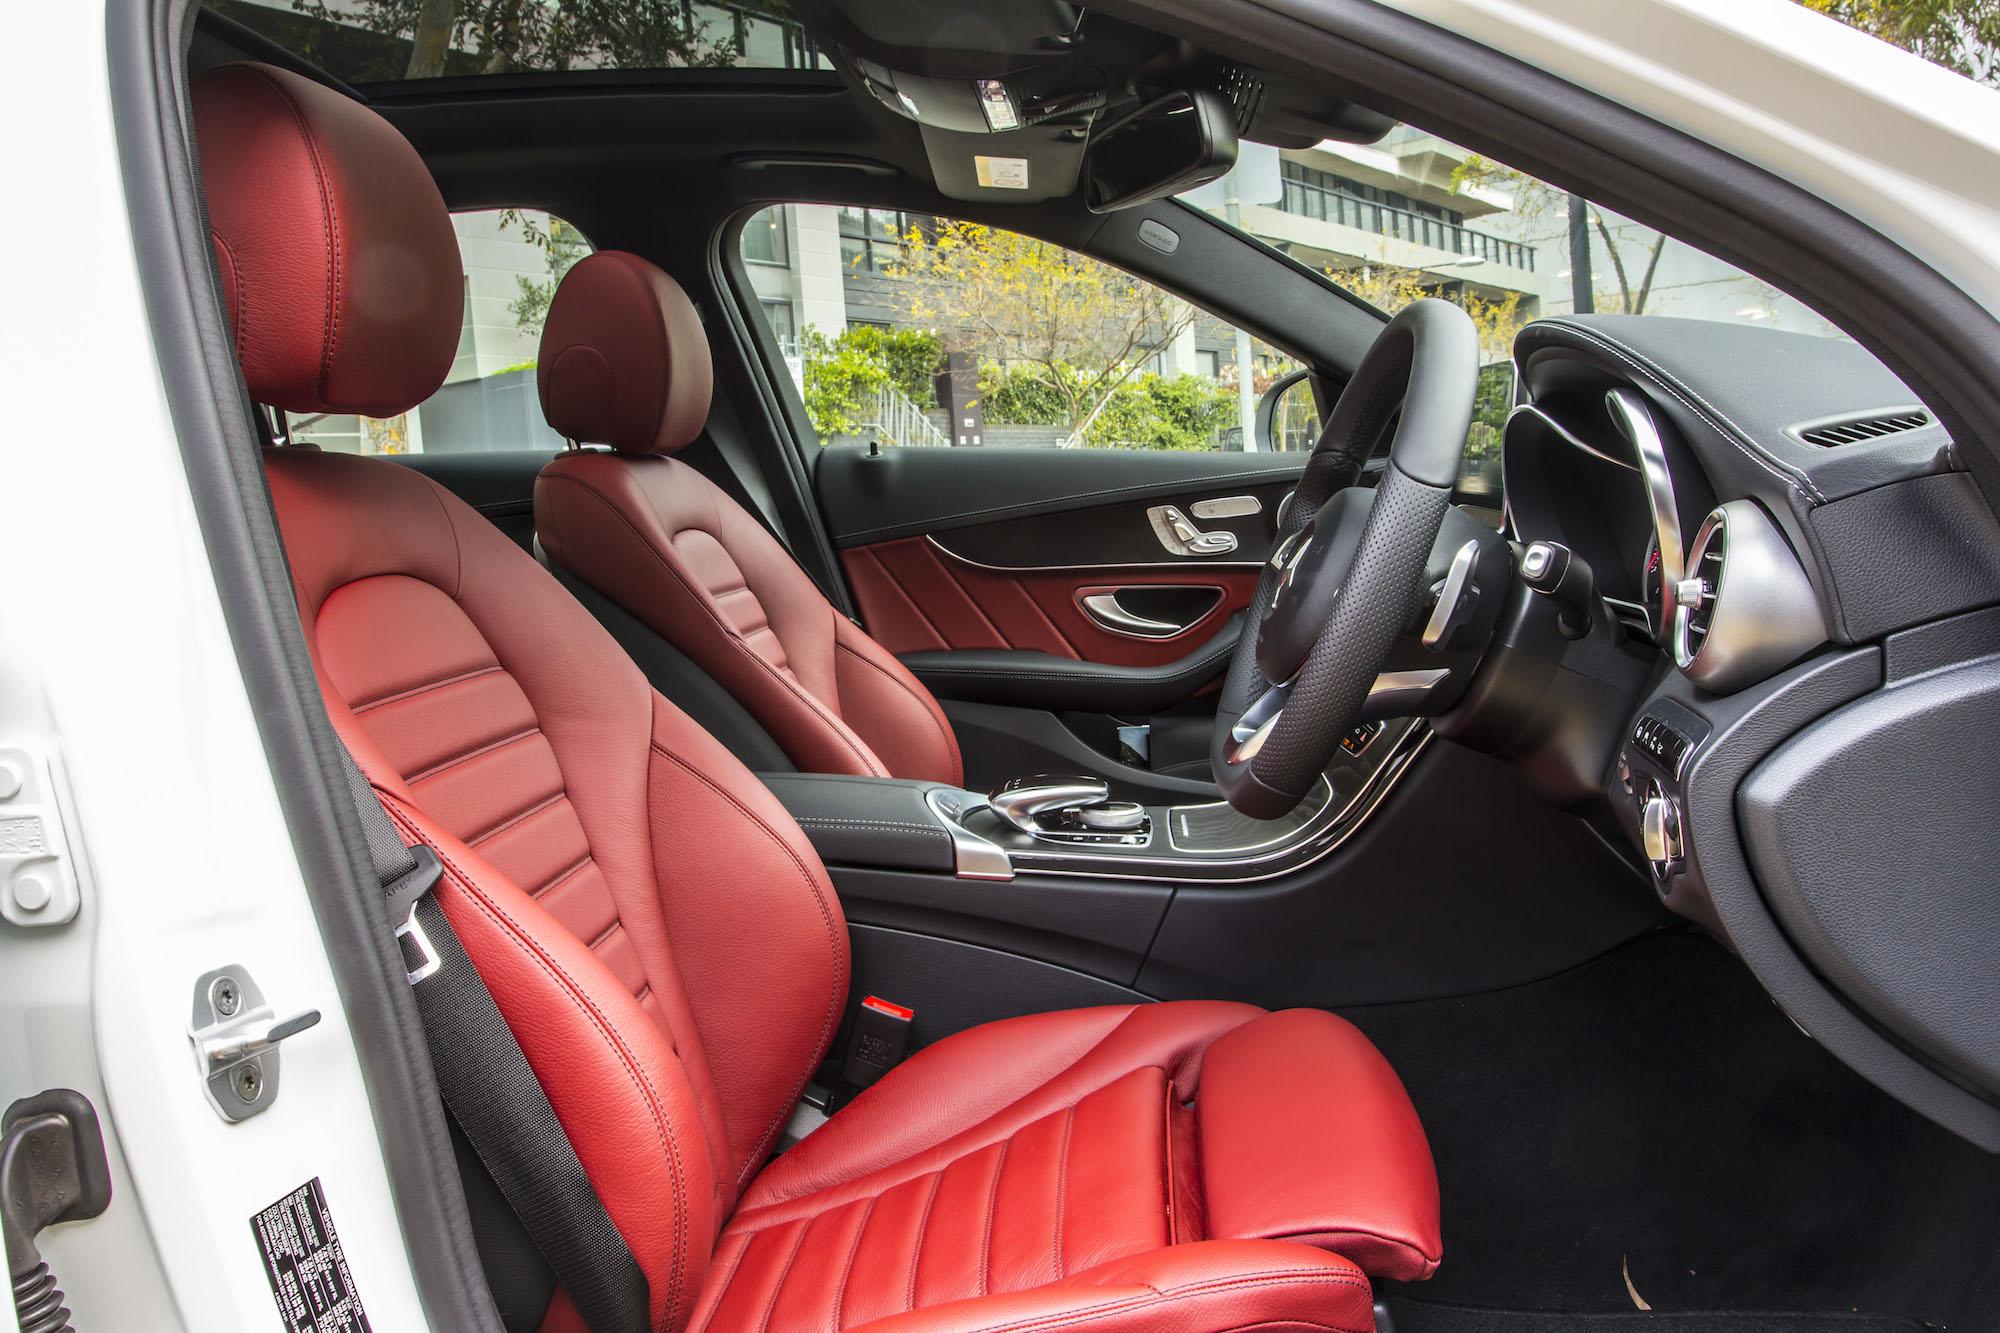 2015 mercedes benz c250 review photos caradvice for Mercedes benz c250 review